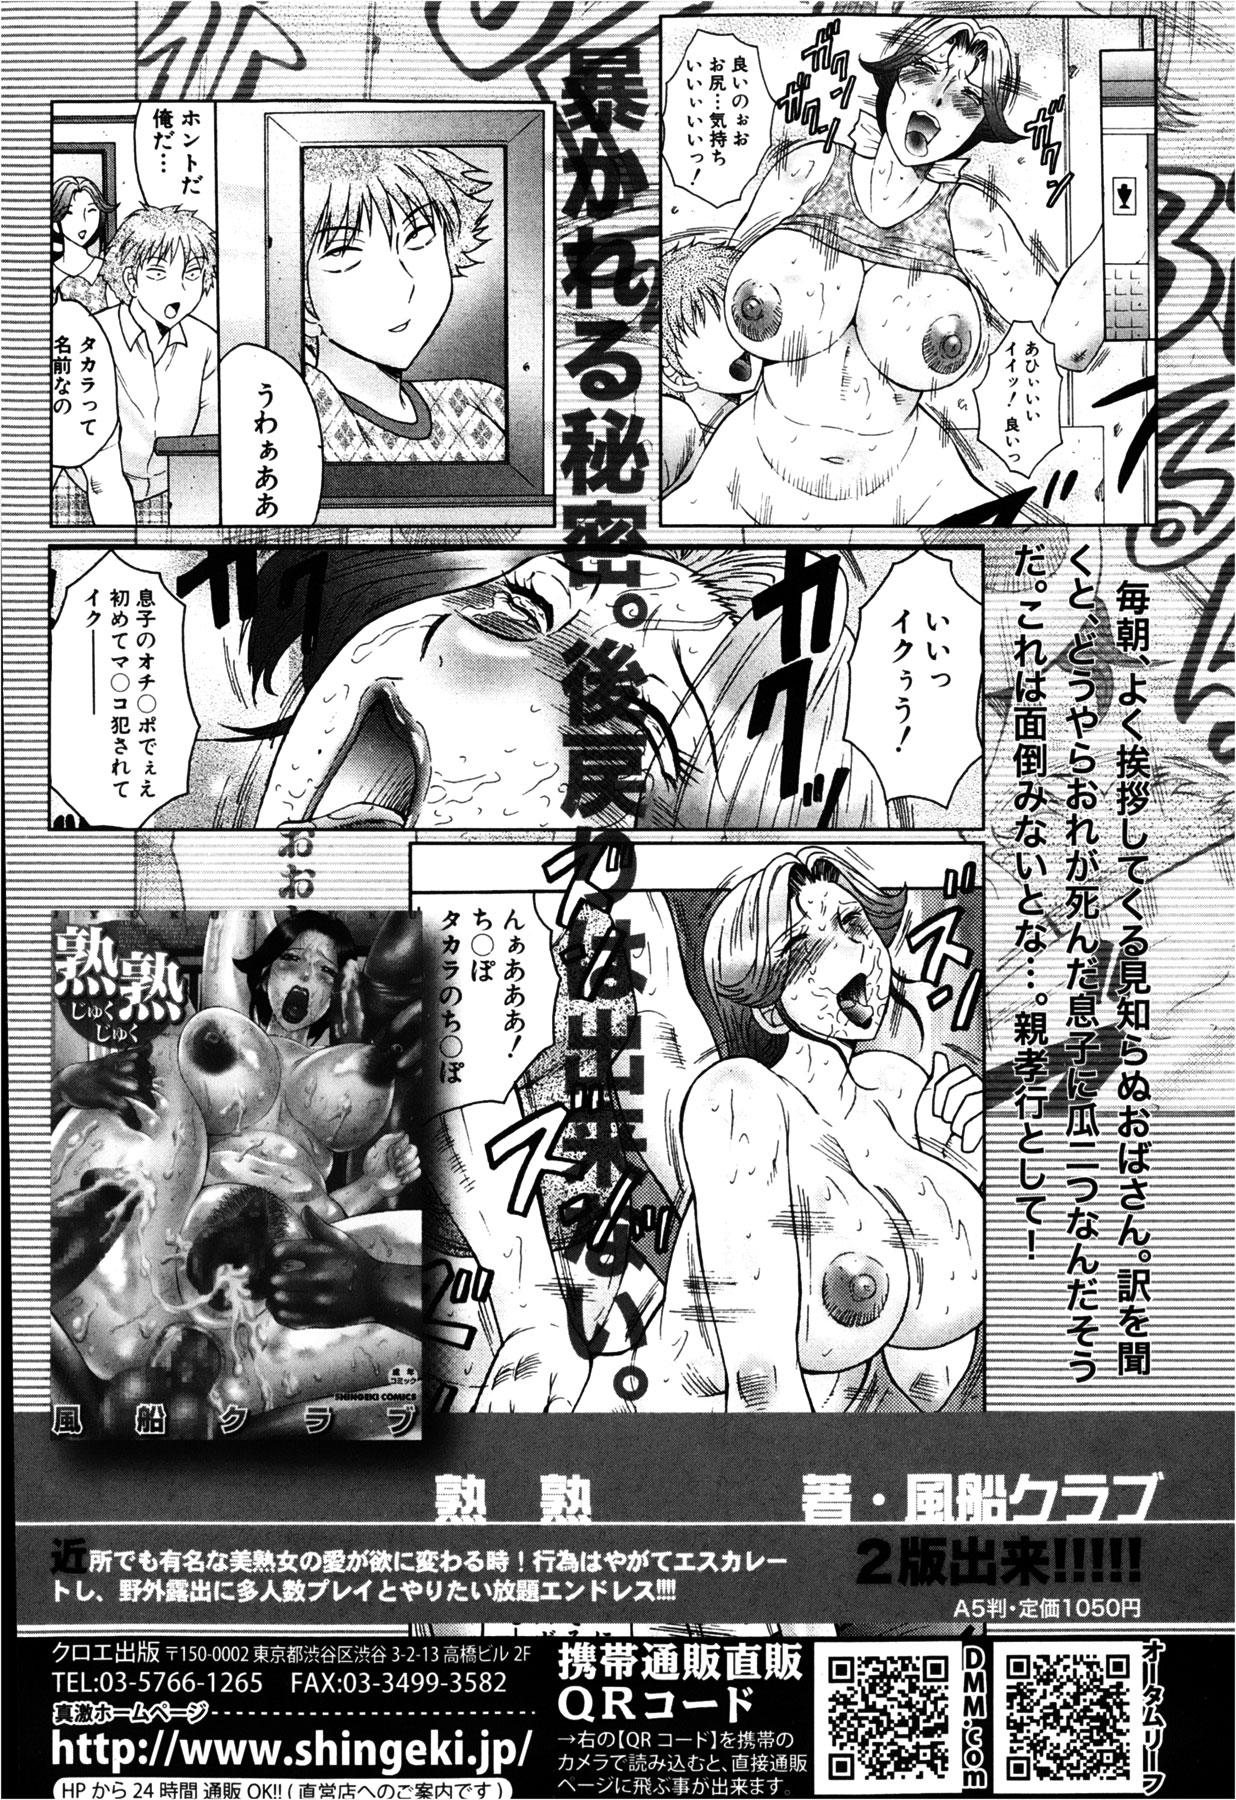 COMIC Shingeki 2013-02 303